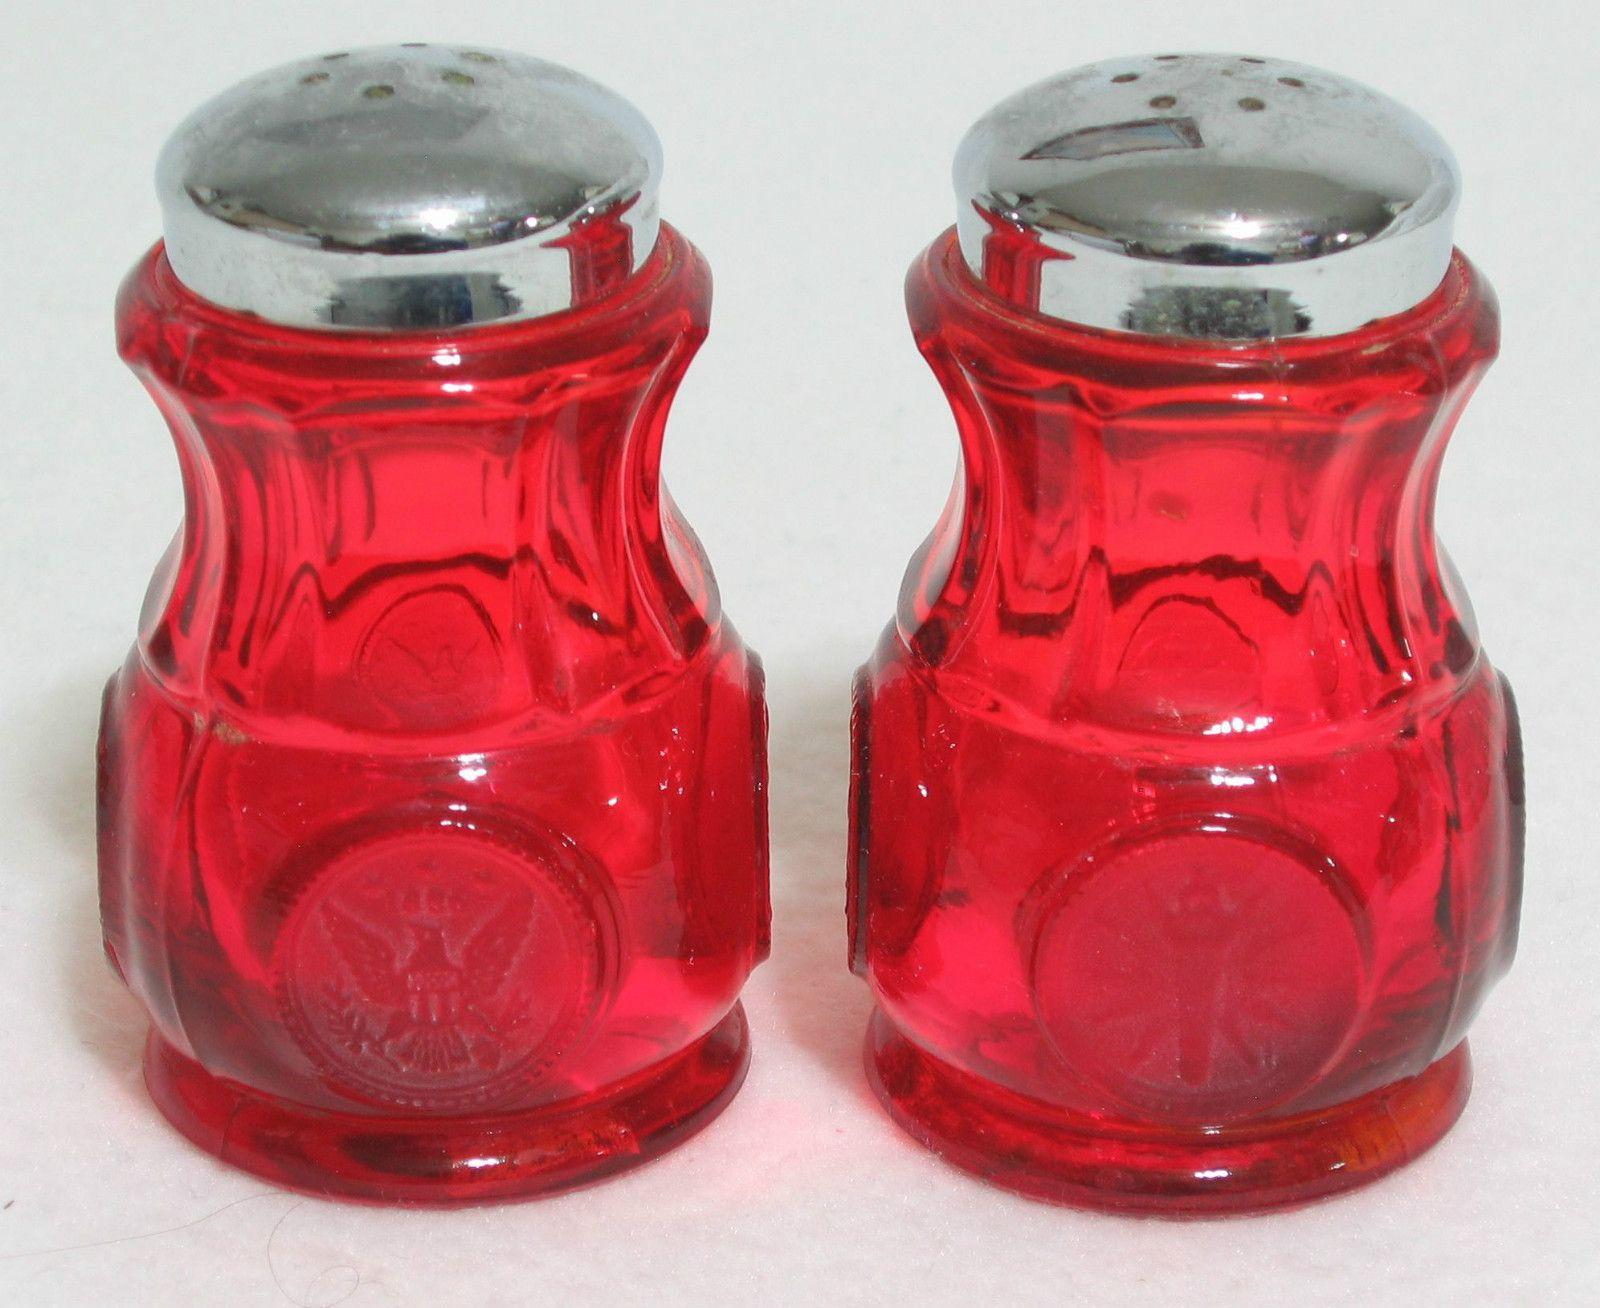 Anchor Hocking Bud Vase Of Anchor Royal Ruby Glass Shakers Vintage Salt and Pepper Regarding Fostoria Ruby Red Coin Glass Salt Pepper Shakers